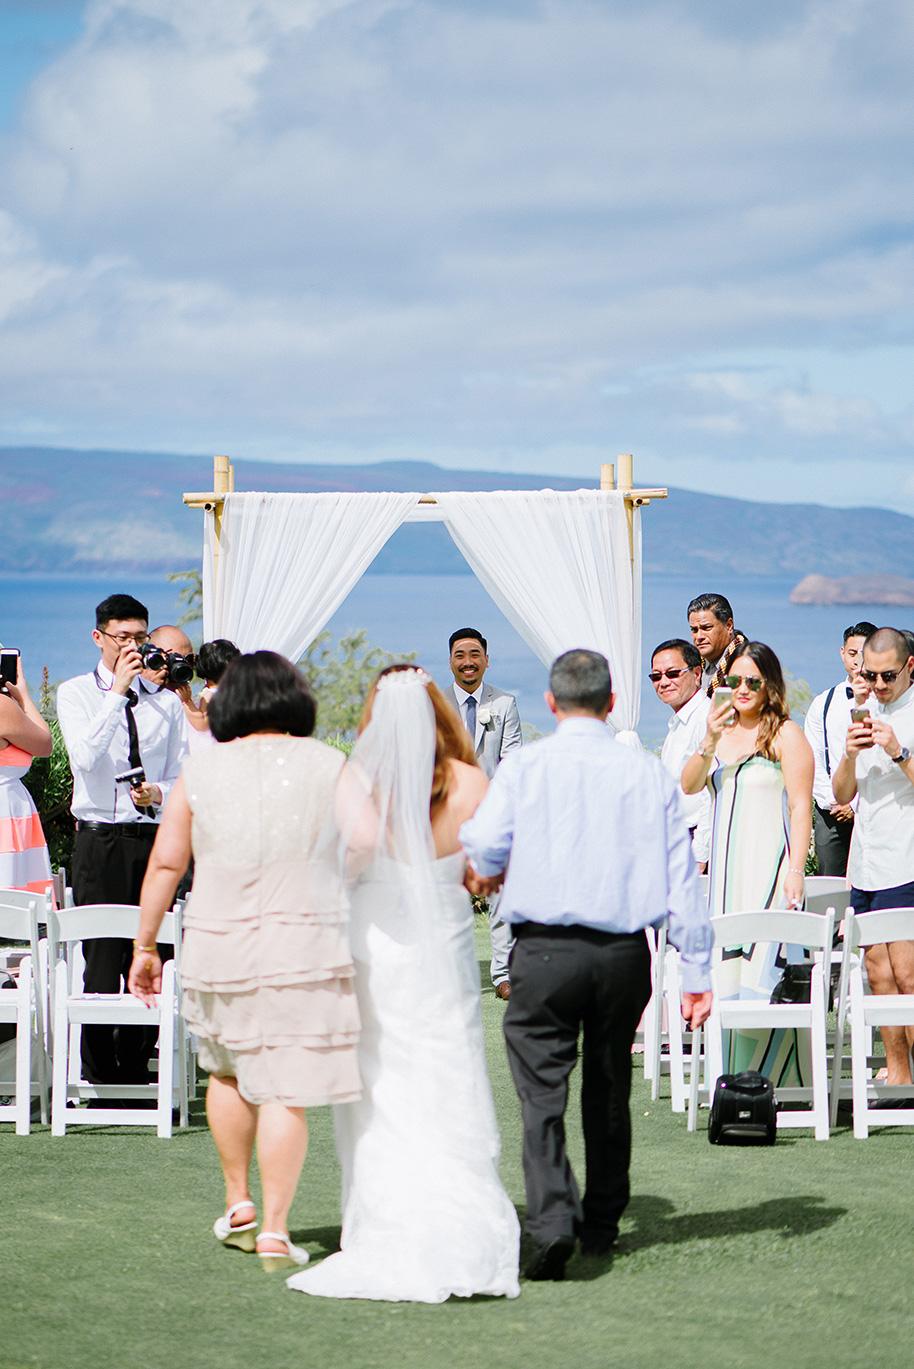 Maui-Wedding-052416-9